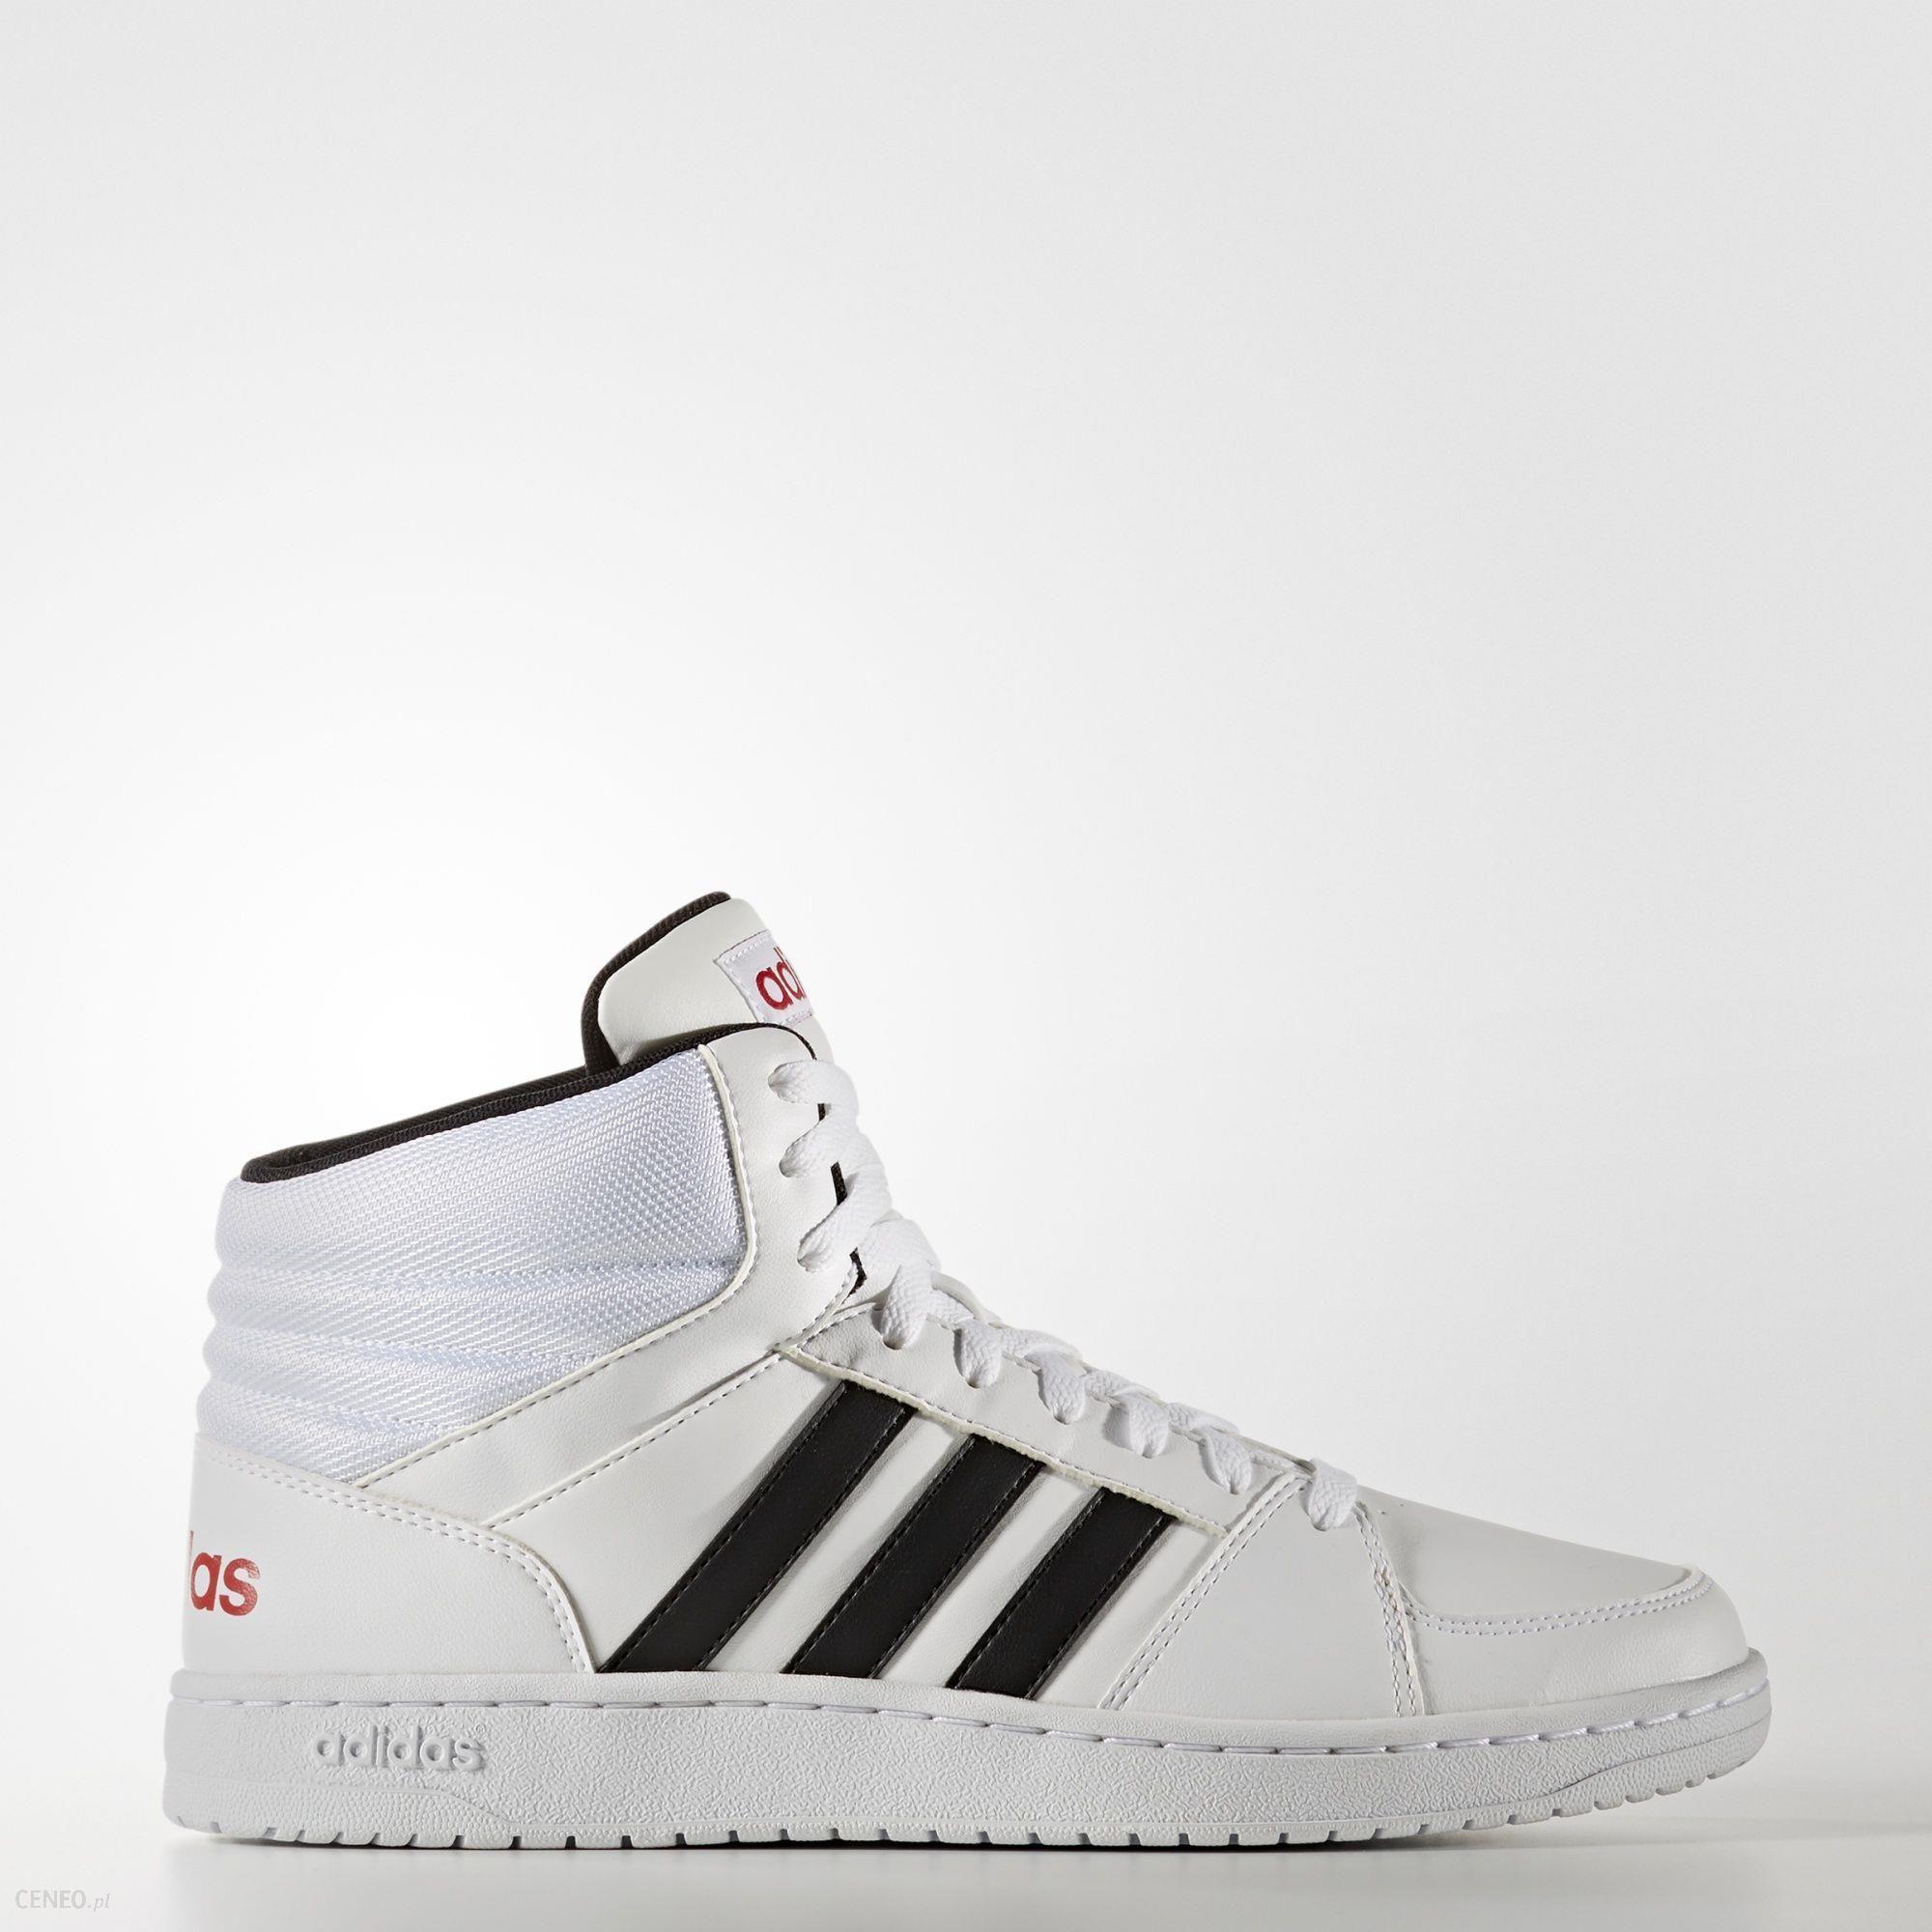 bbb518c1640f6 Buty Adidas Neo VS Hoops Mid - B74501 - Ceny i opinie - Ceneo.pl